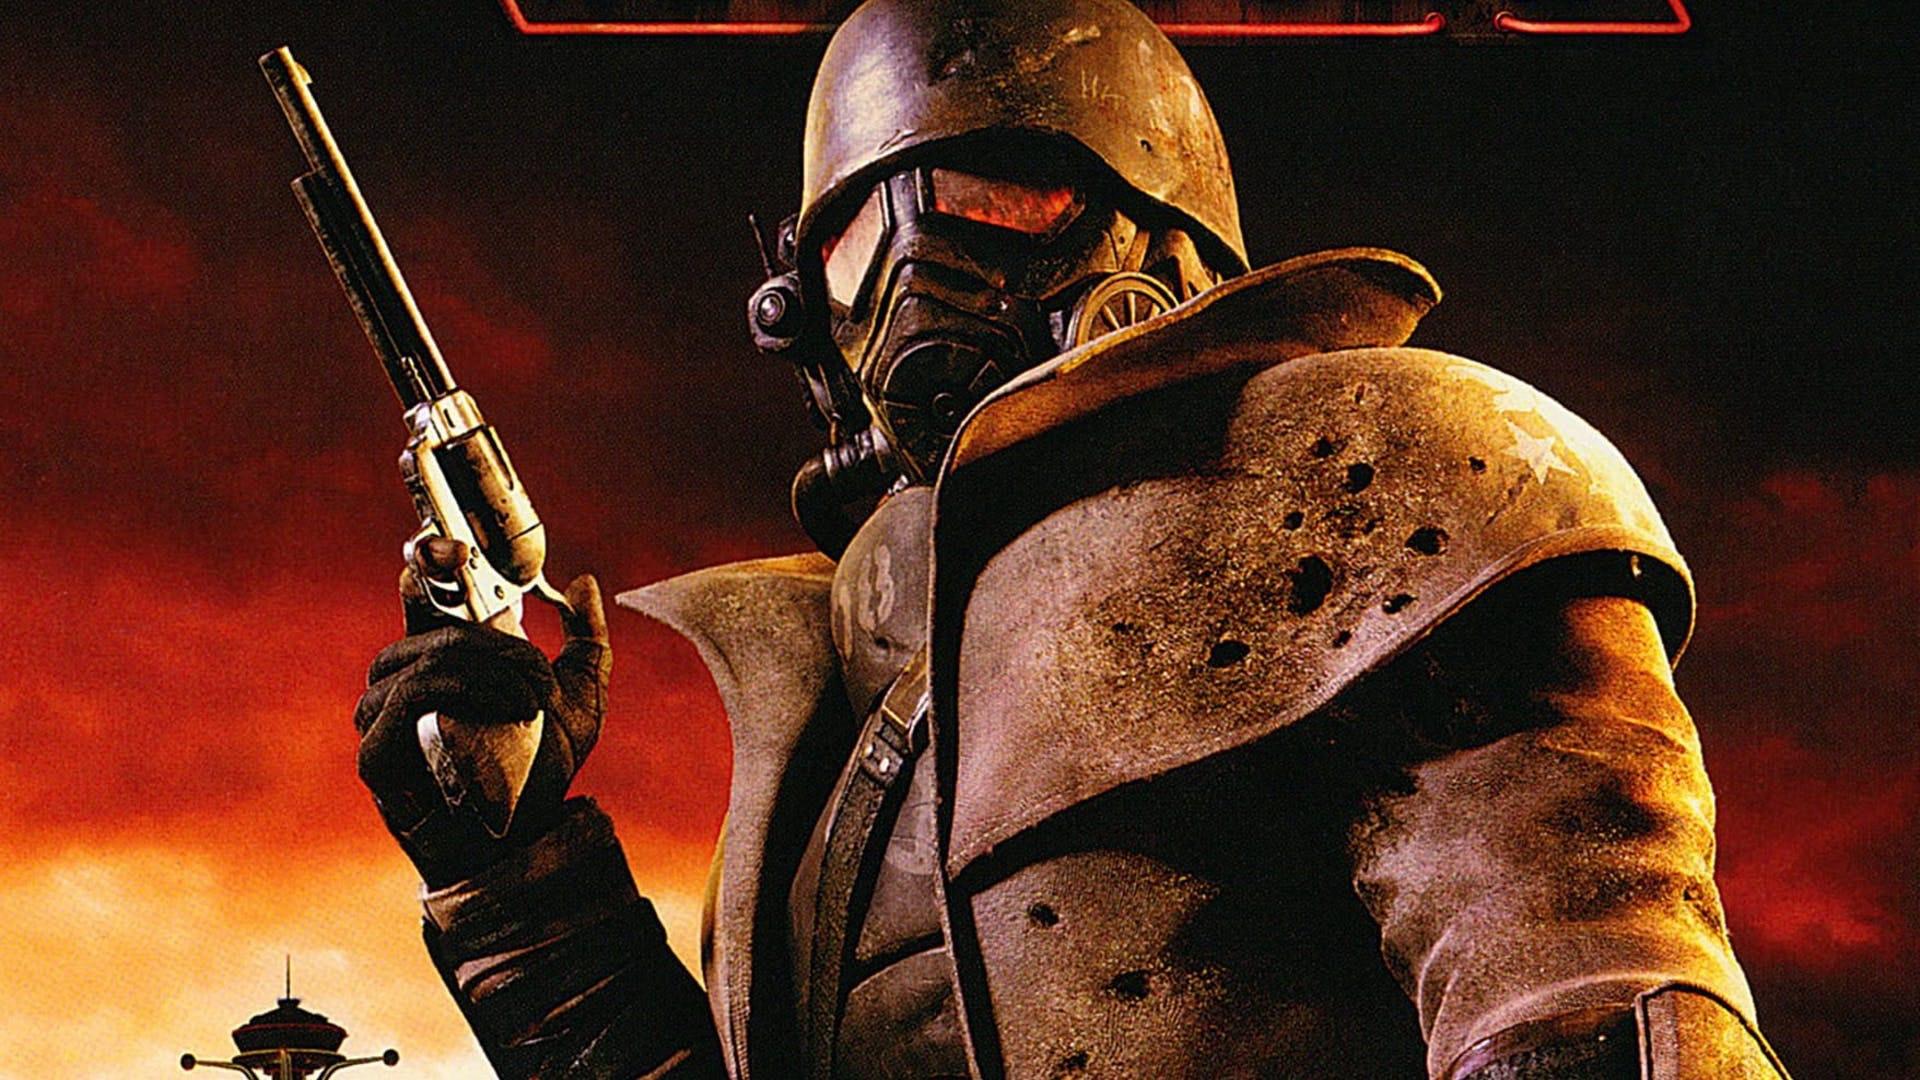 Fallout: New Vegas Soundtrack